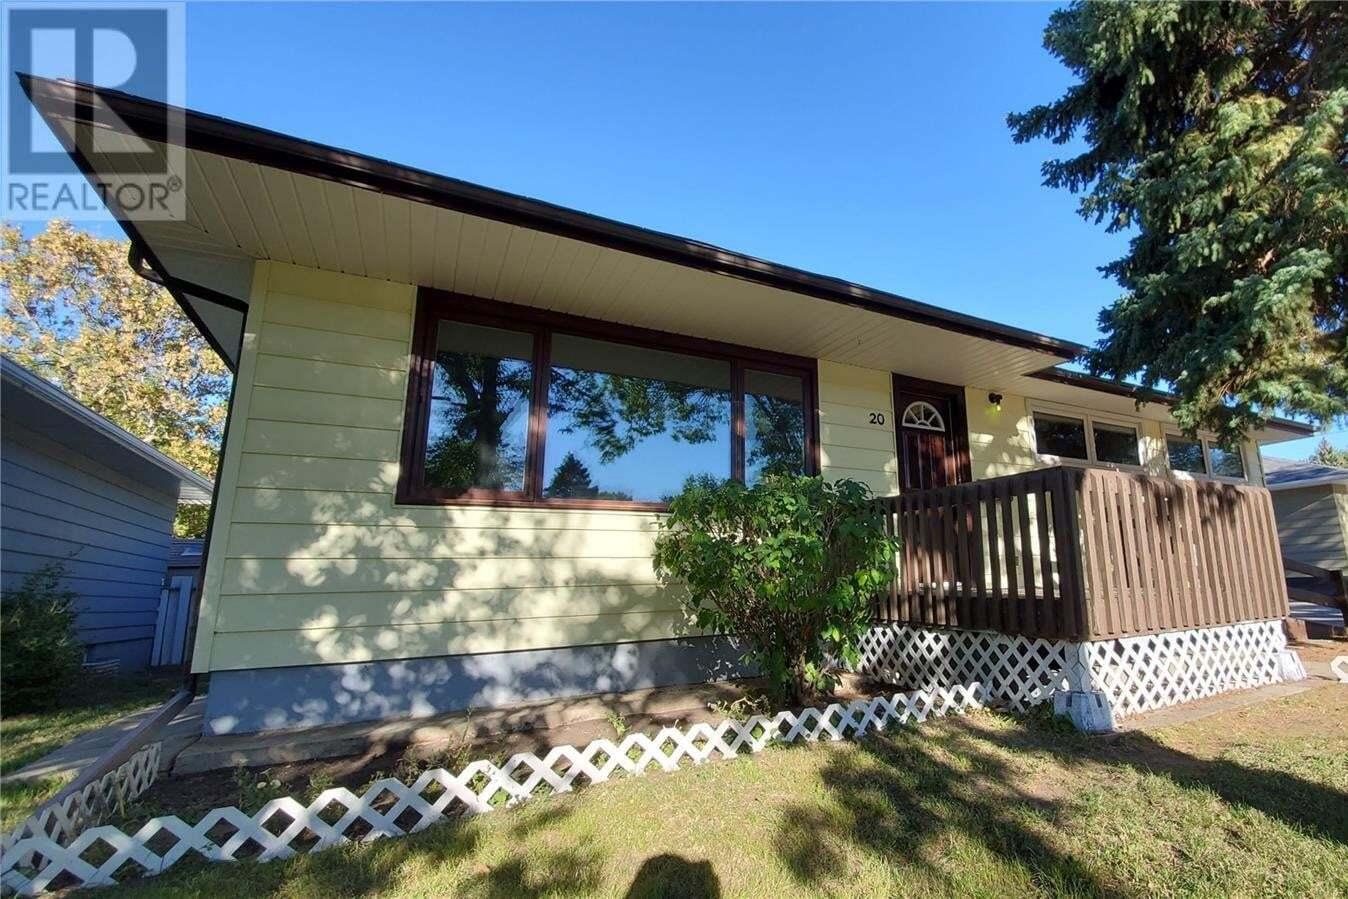 House for sale at 20 Manor Rd Regina Saskatchewan - MLS: SK826516